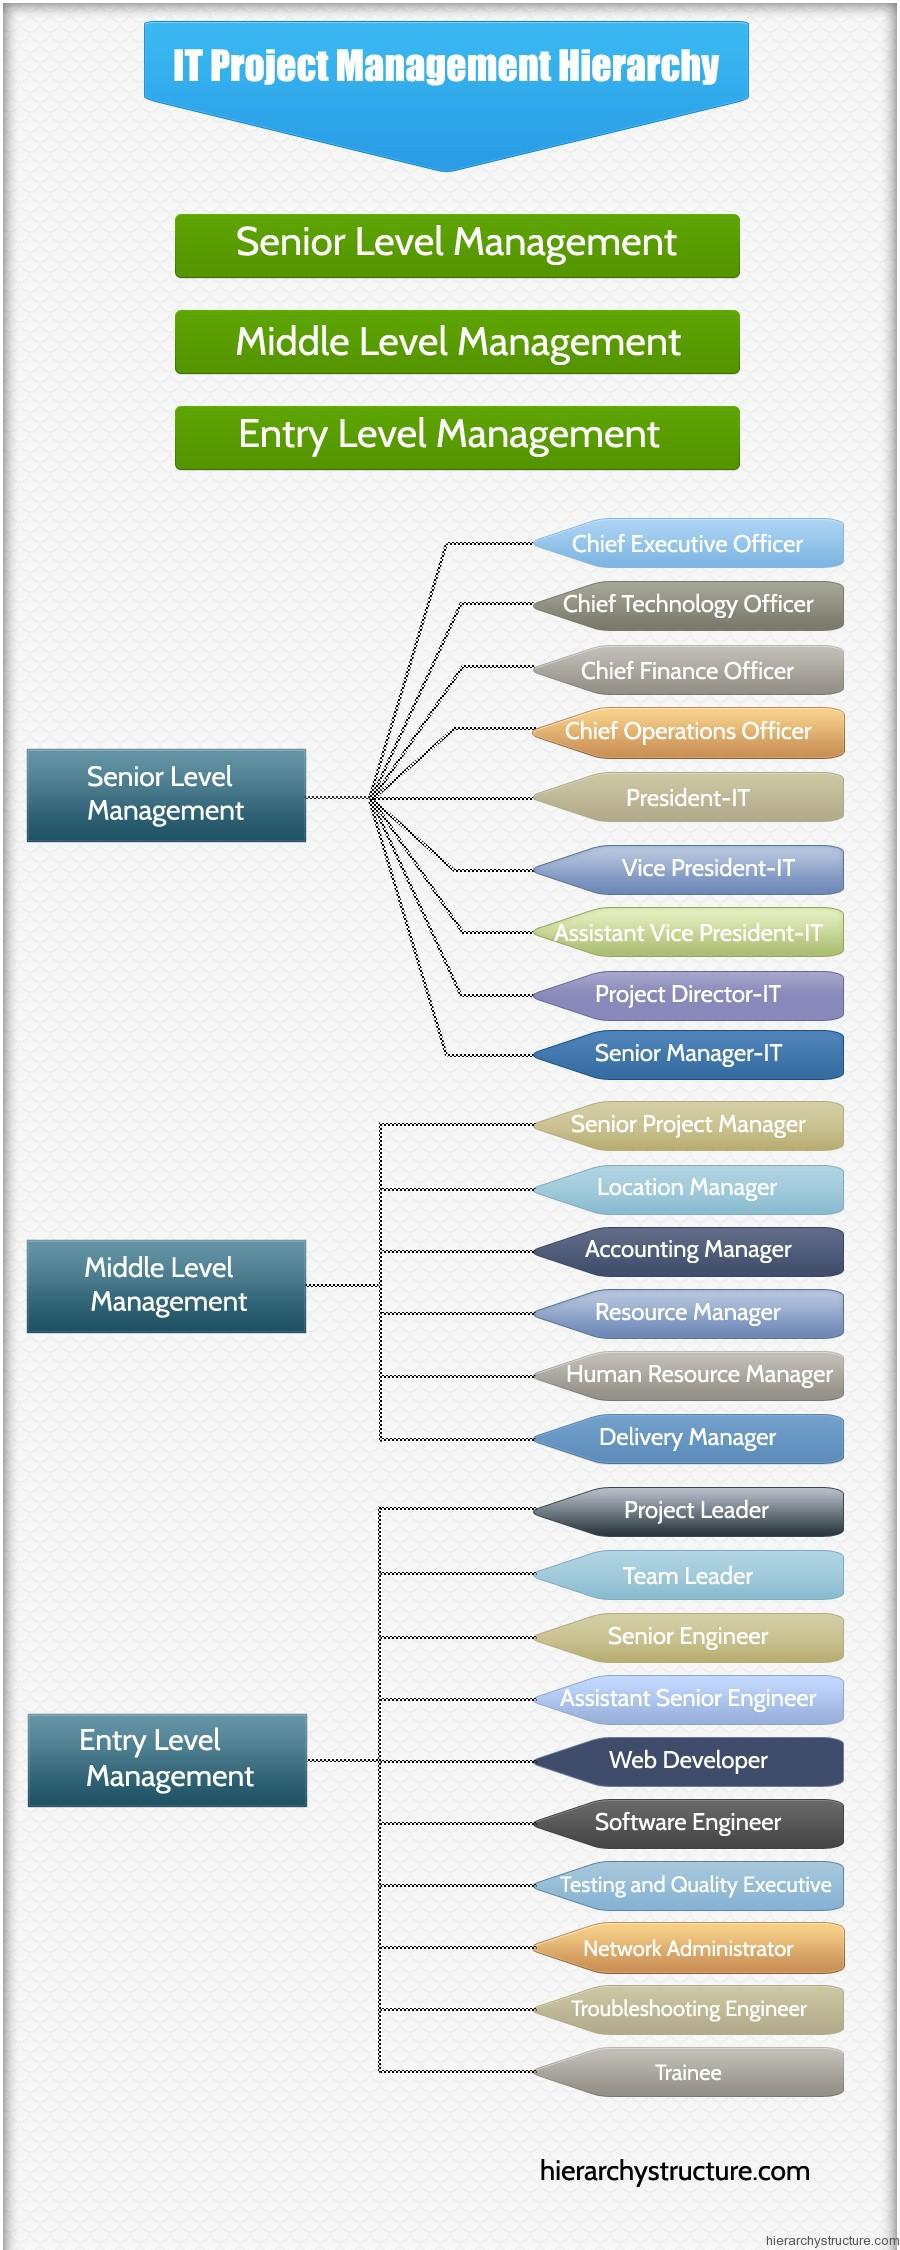 IT Project Management Hierarchy